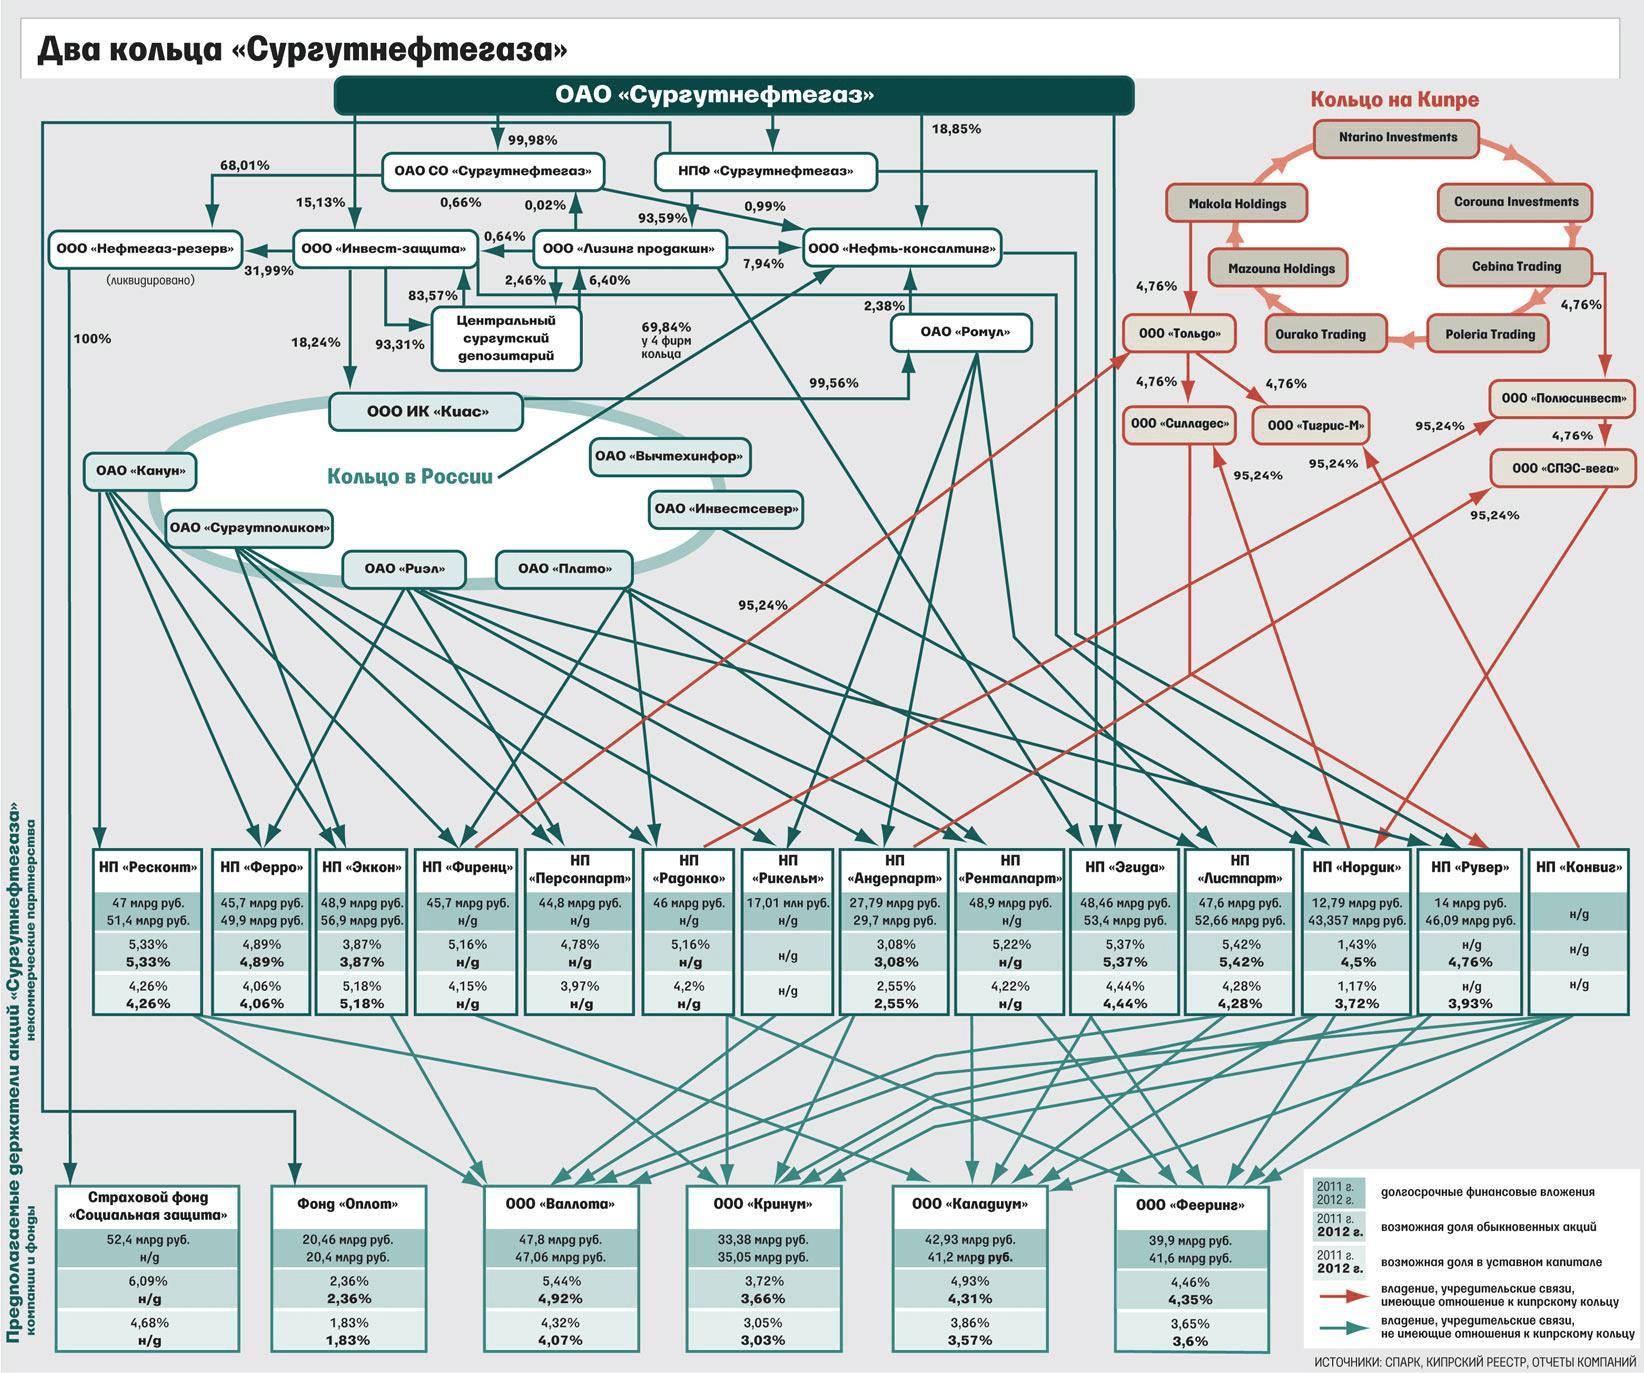 Закольцованные структуры Сургутнефтегаза